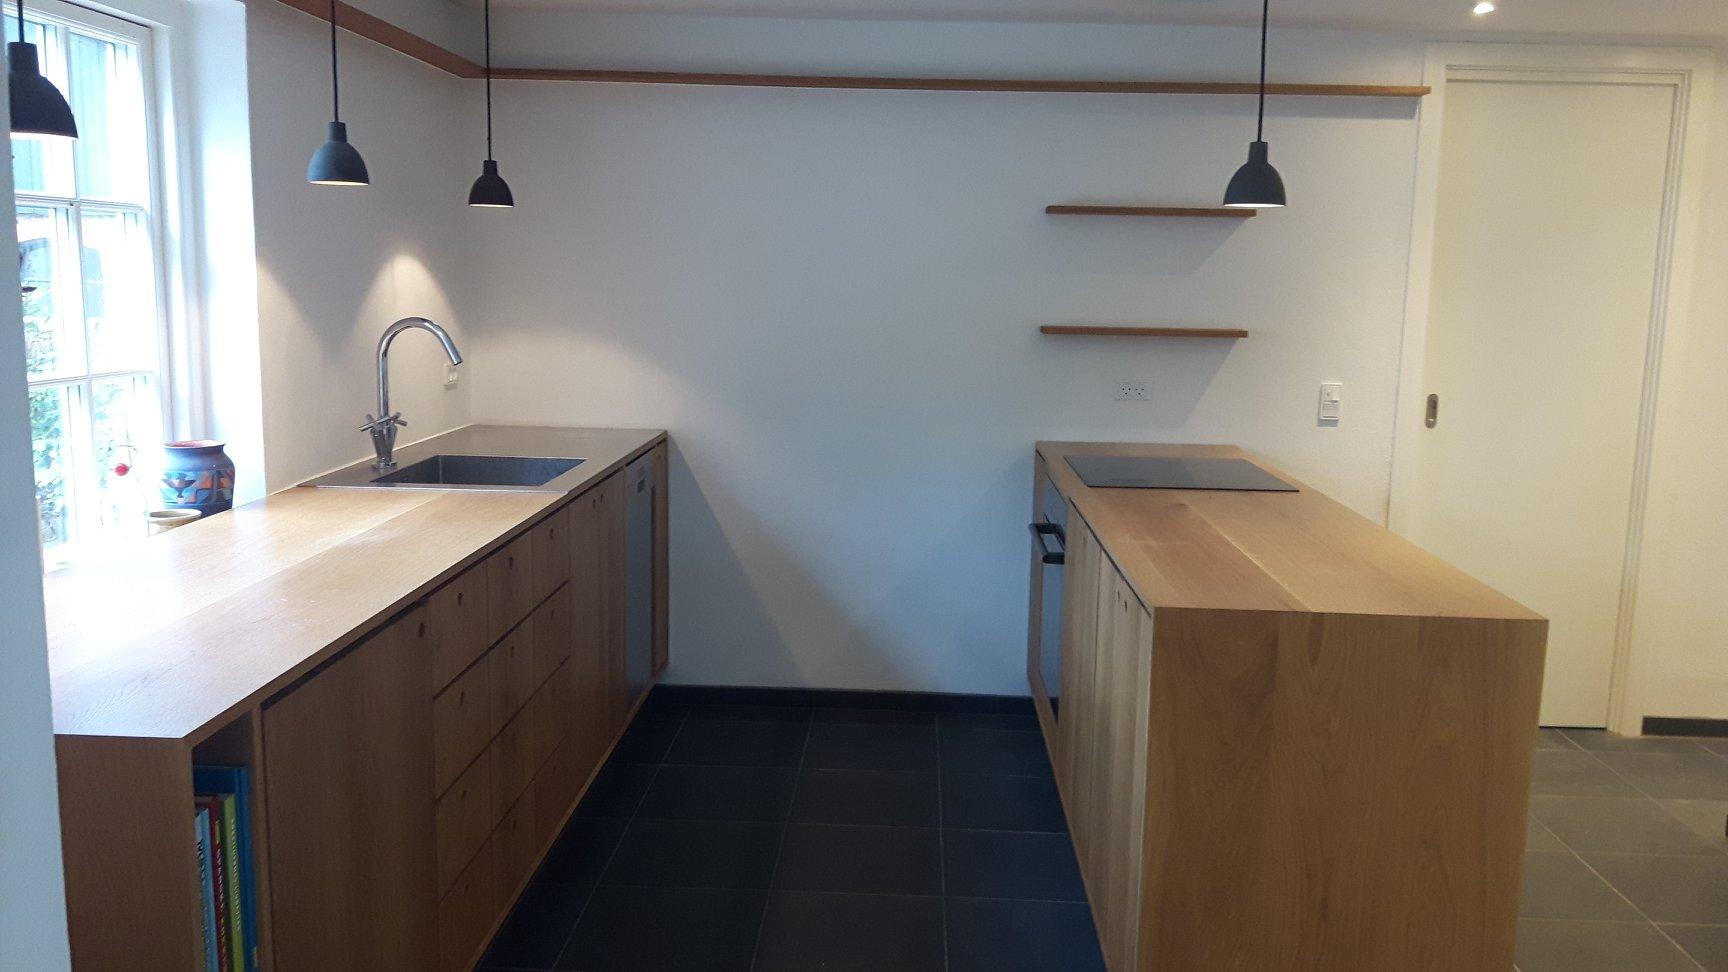 Køkken i massiv eg, privat kunde